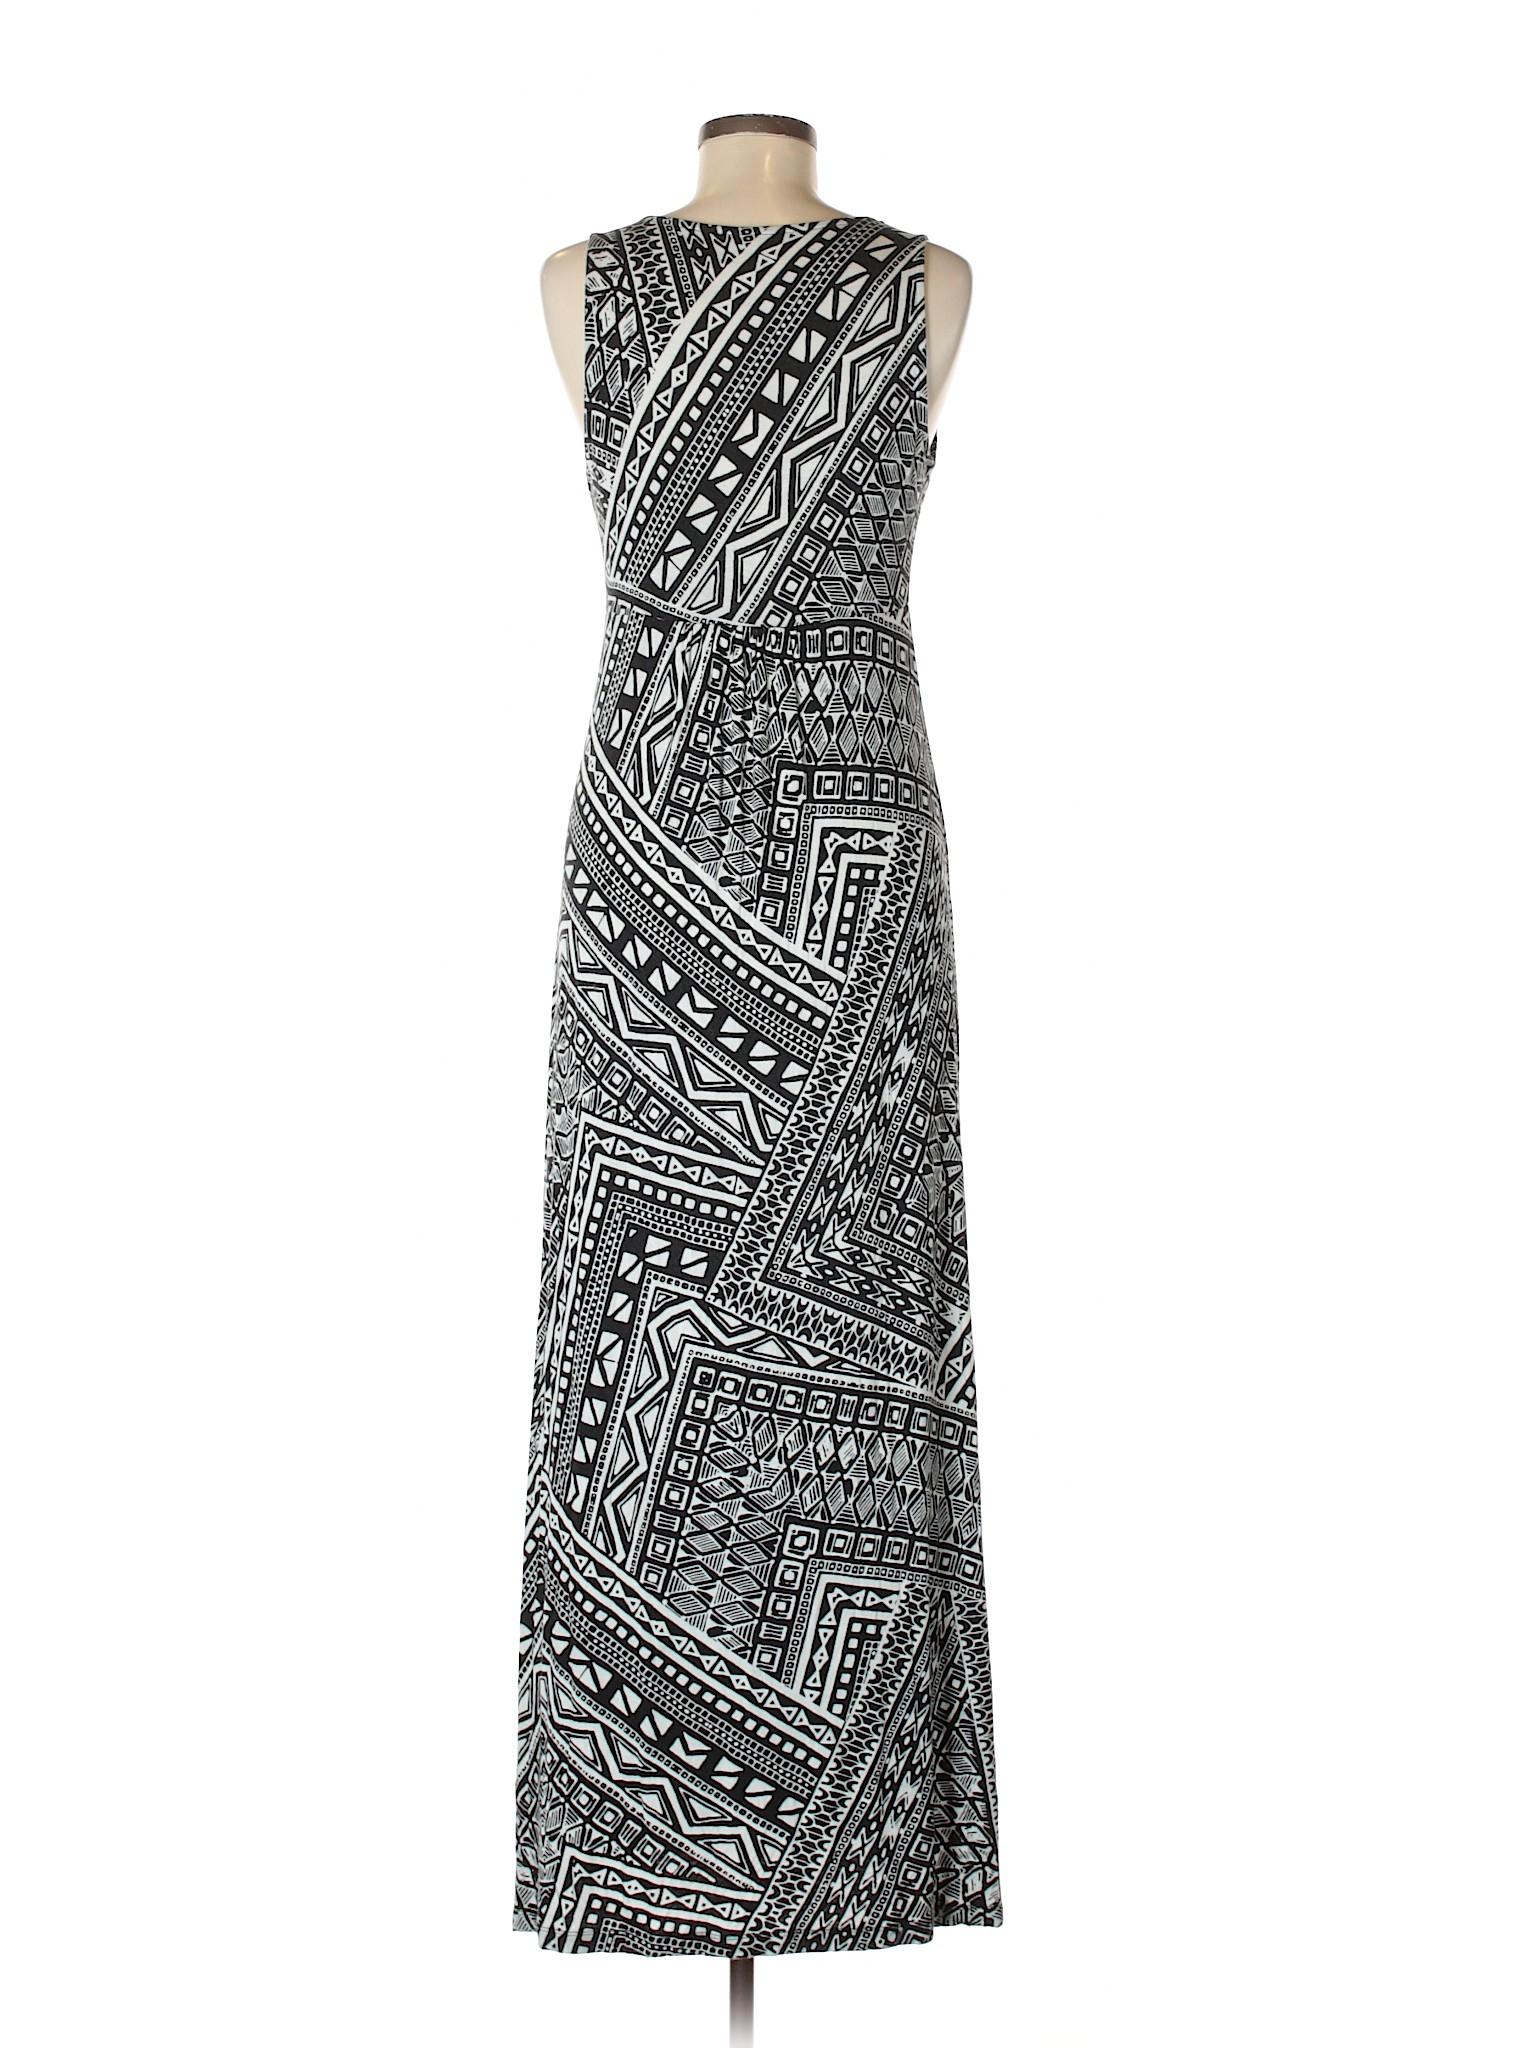 Dress Boutique Apt 9 winter Casual xIrgFIfqw